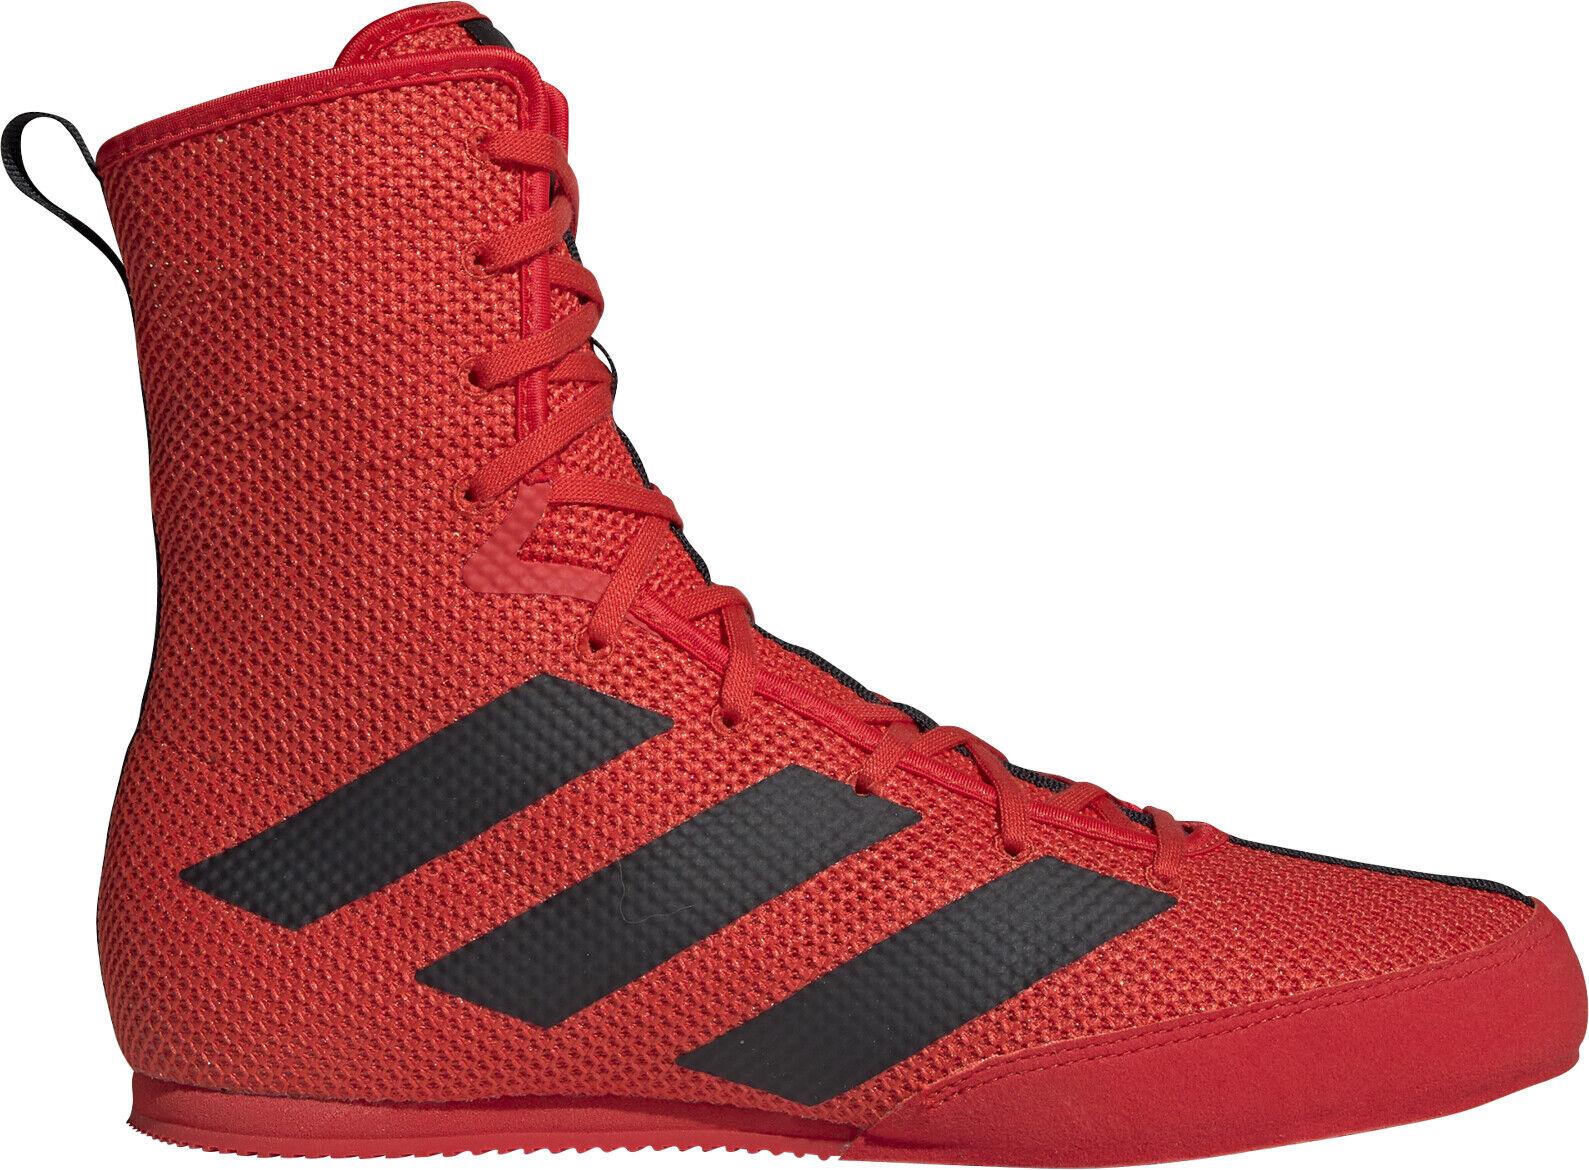 Adidas Box Hog 3 Mens Boxing shoes - Red